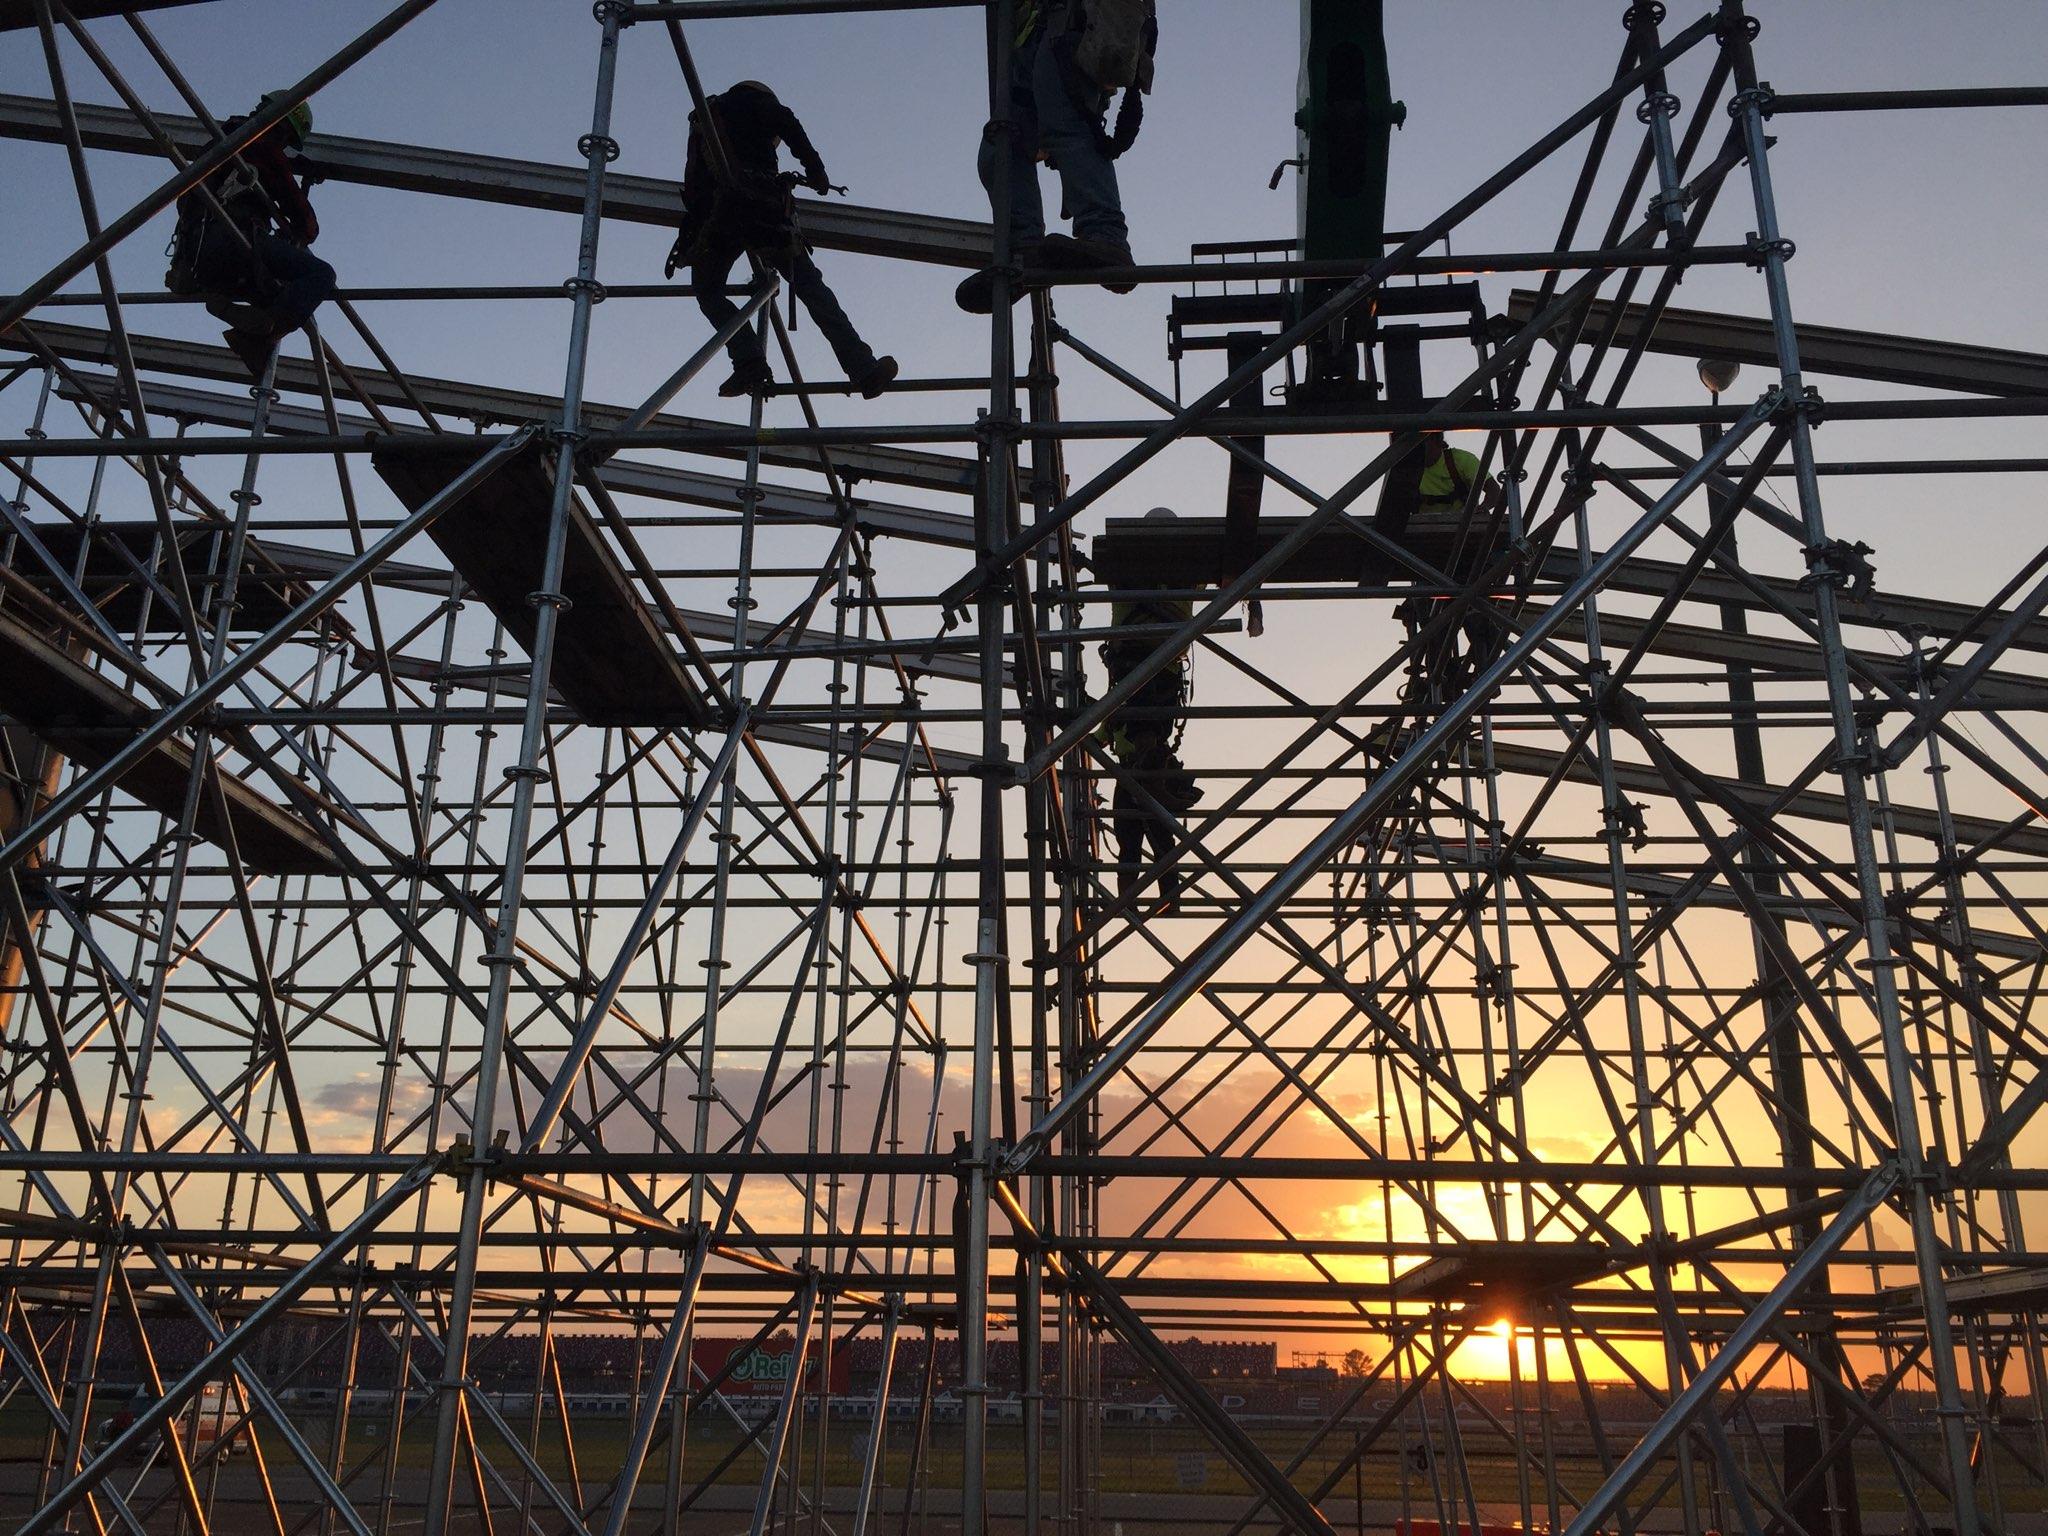 Sunset behind the scaffold at Talladega